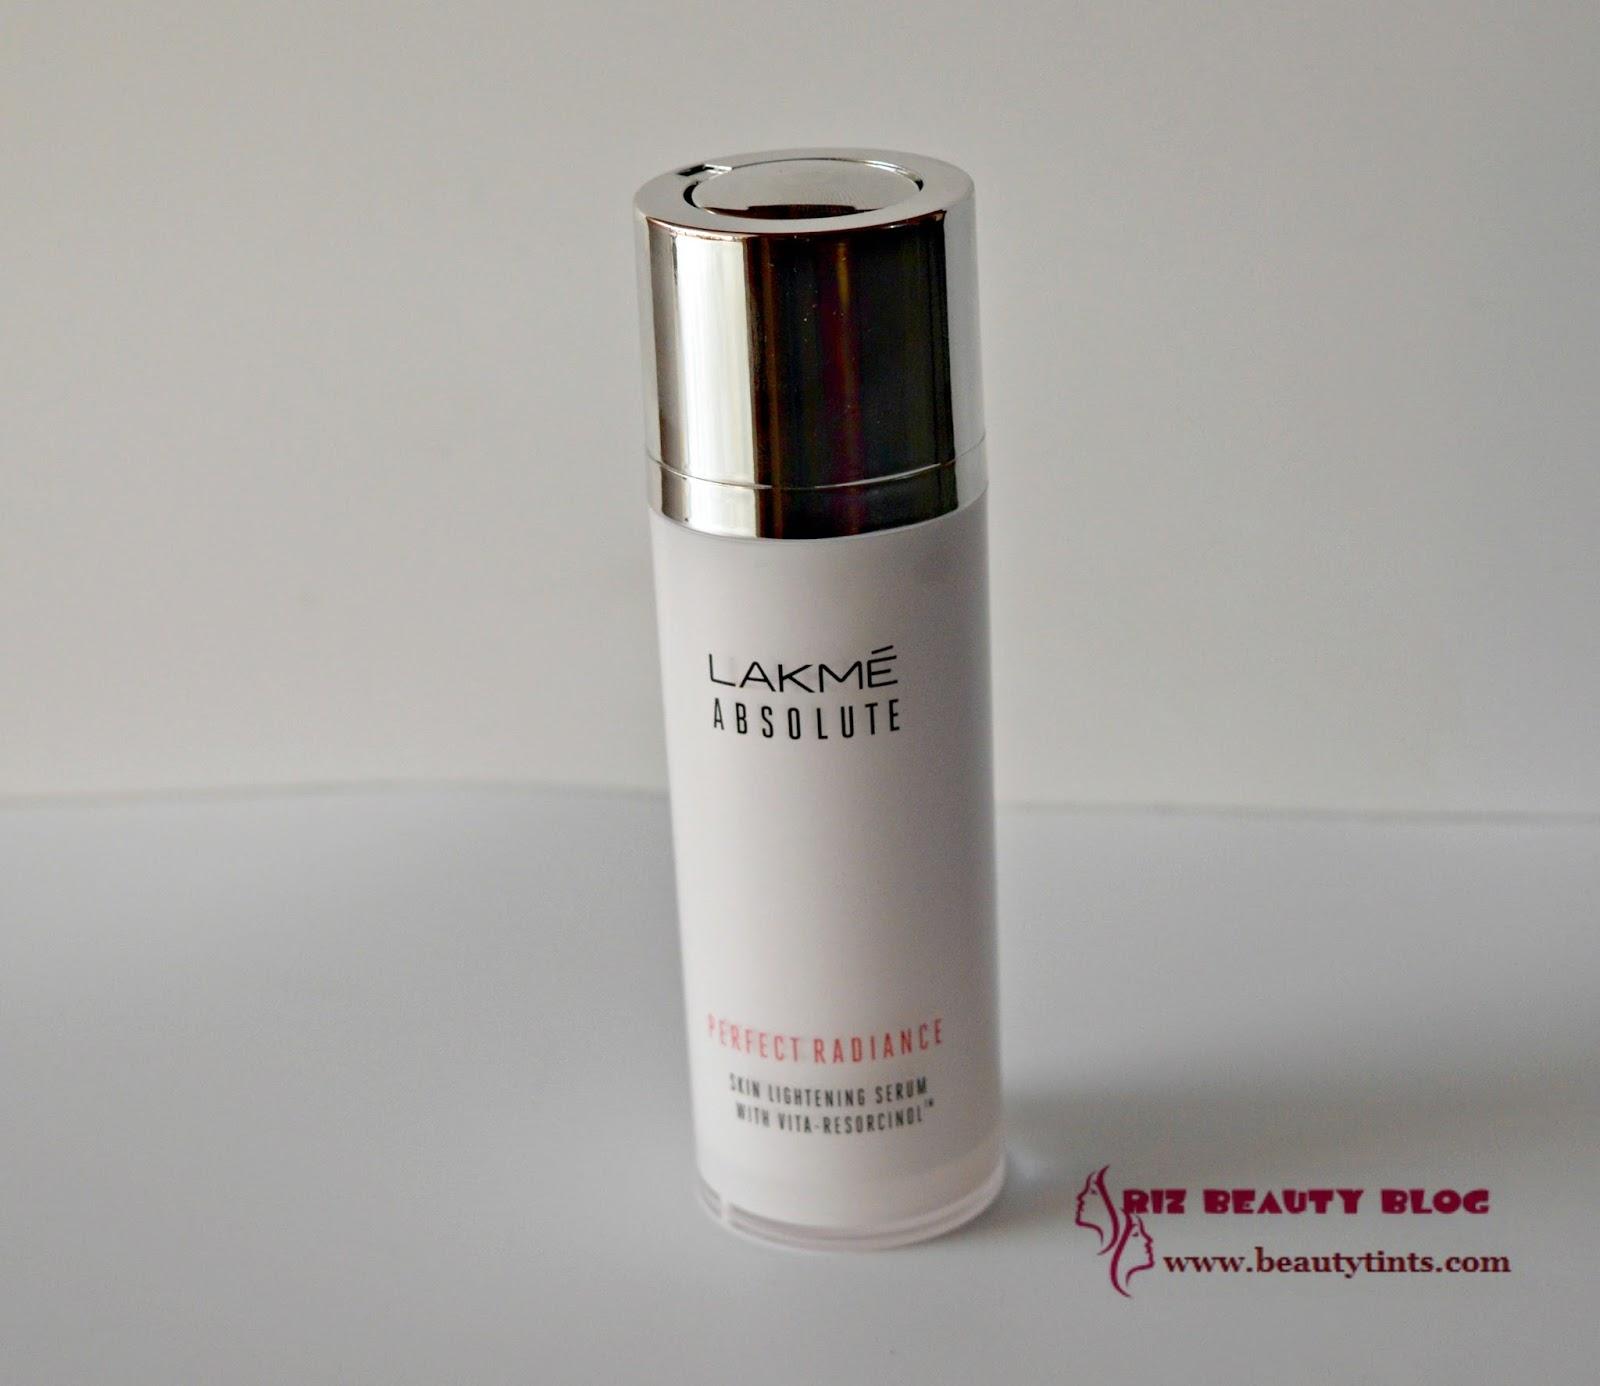 Sriz Beauty Blog Lakme Absolute Perfect Radiance Skin Lightening Serum Review